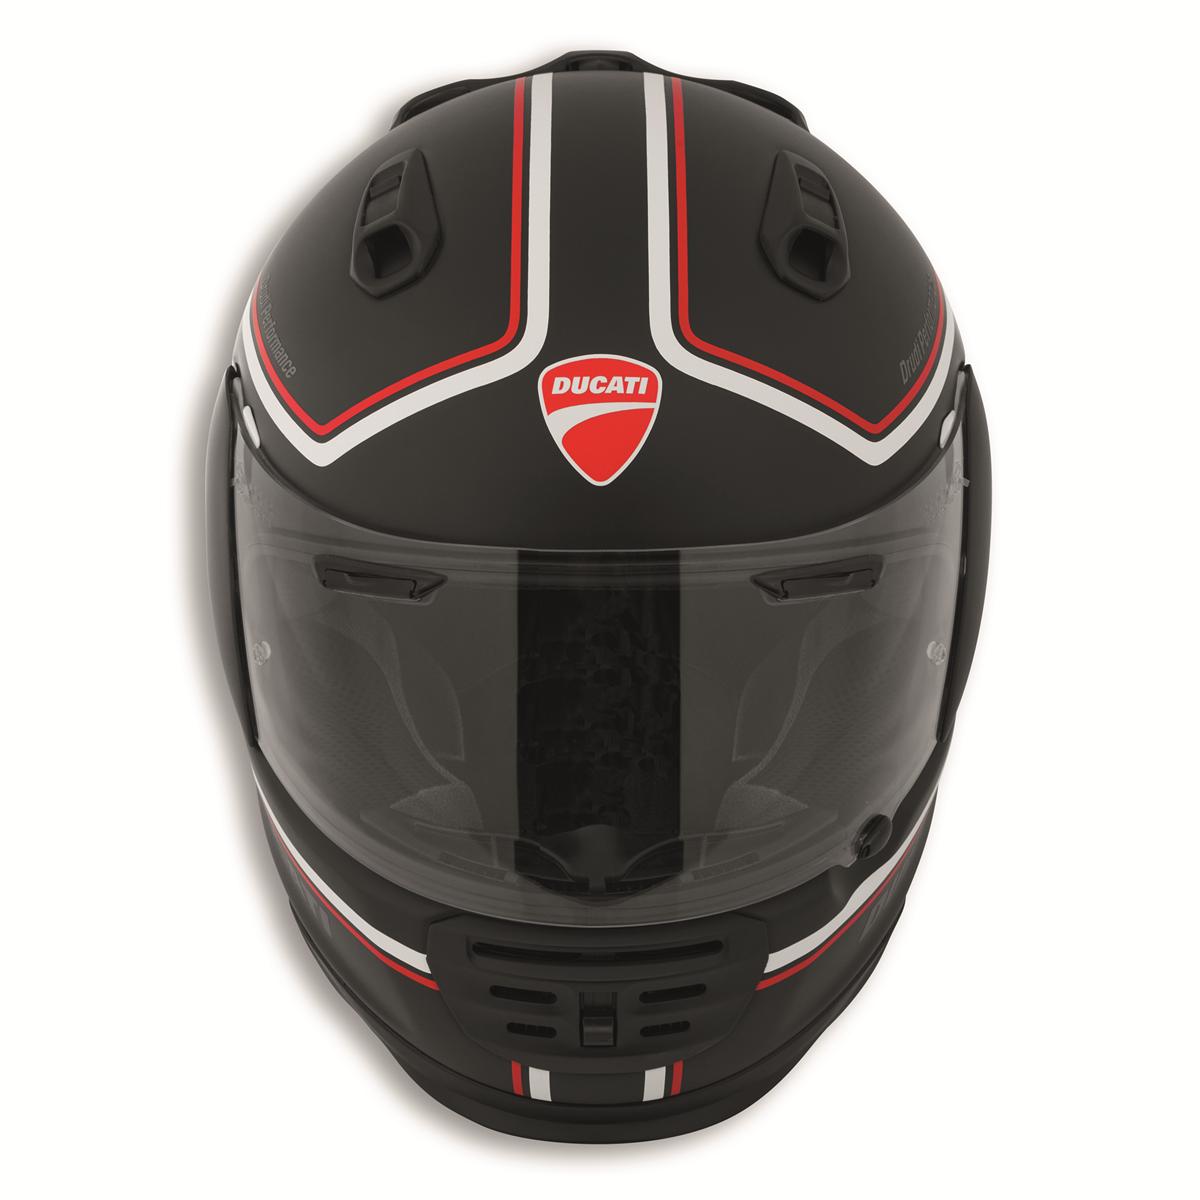 casque arai rebel ducati red line s team motos. Black Bedroom Furniture Sets. Home Design Ideas